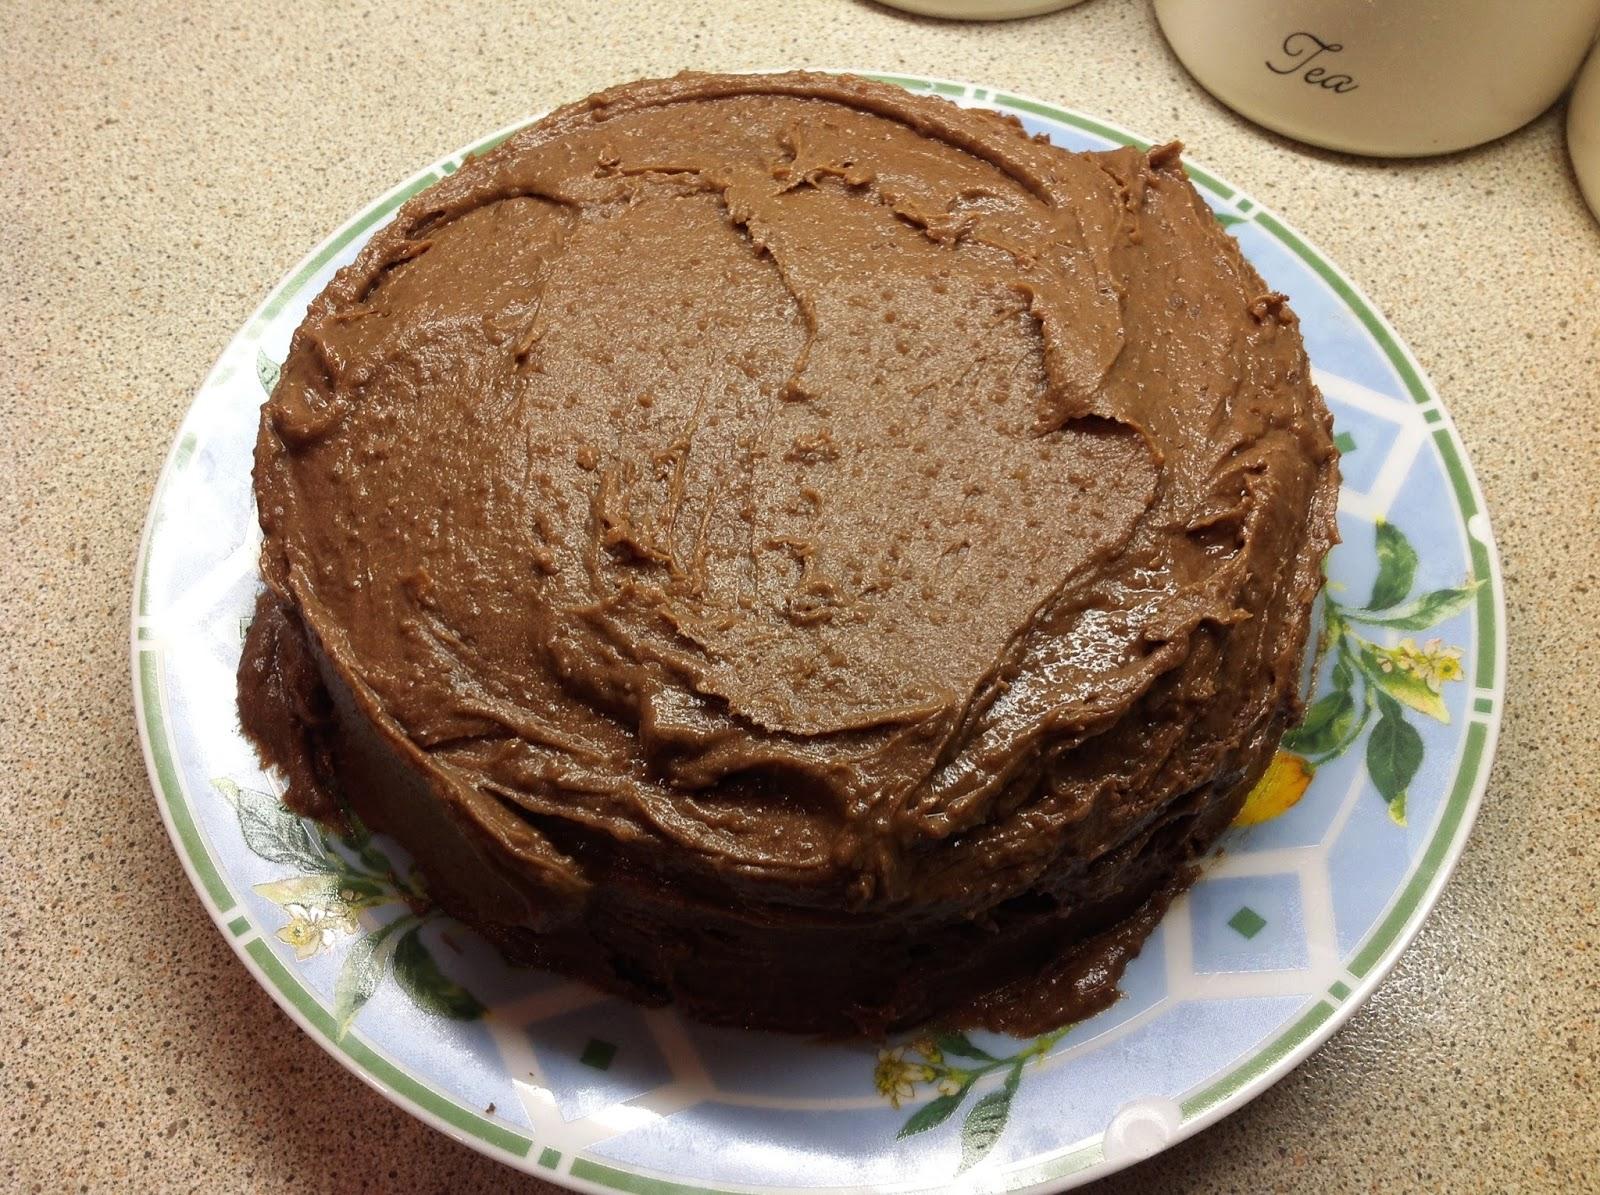 This Muslim Girl Bakes: Chocolate Fudge Cake